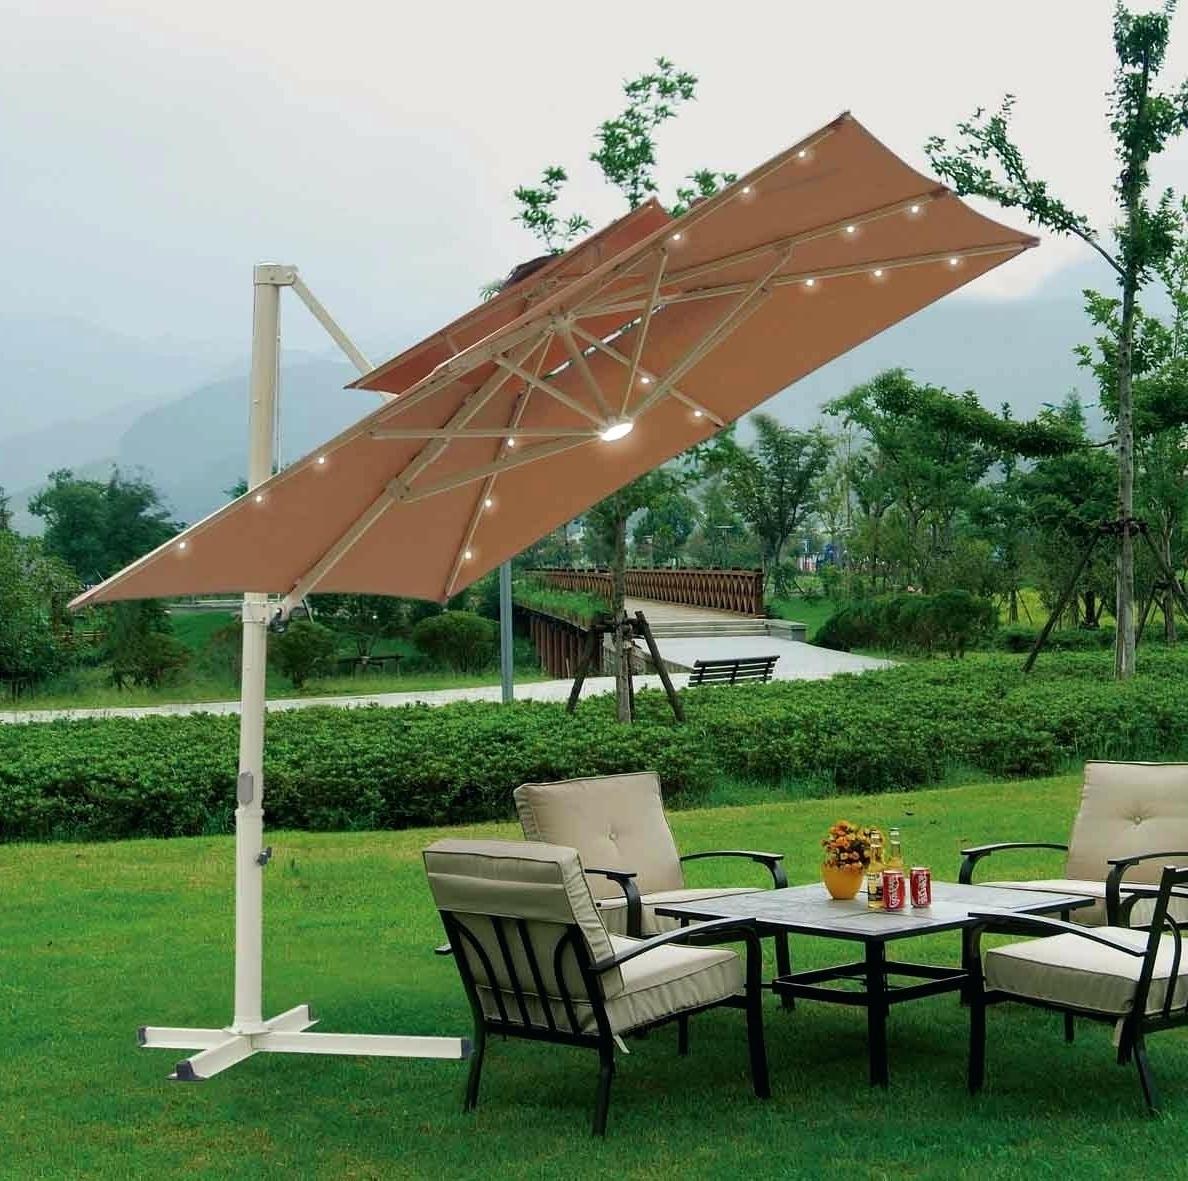 Fashionable Rectangular Offset Patio Umbrellas With Regard To Patio Umbrella Solar Lights Home Depot 10 Foot Wide Rectangular (View 9 of 20)